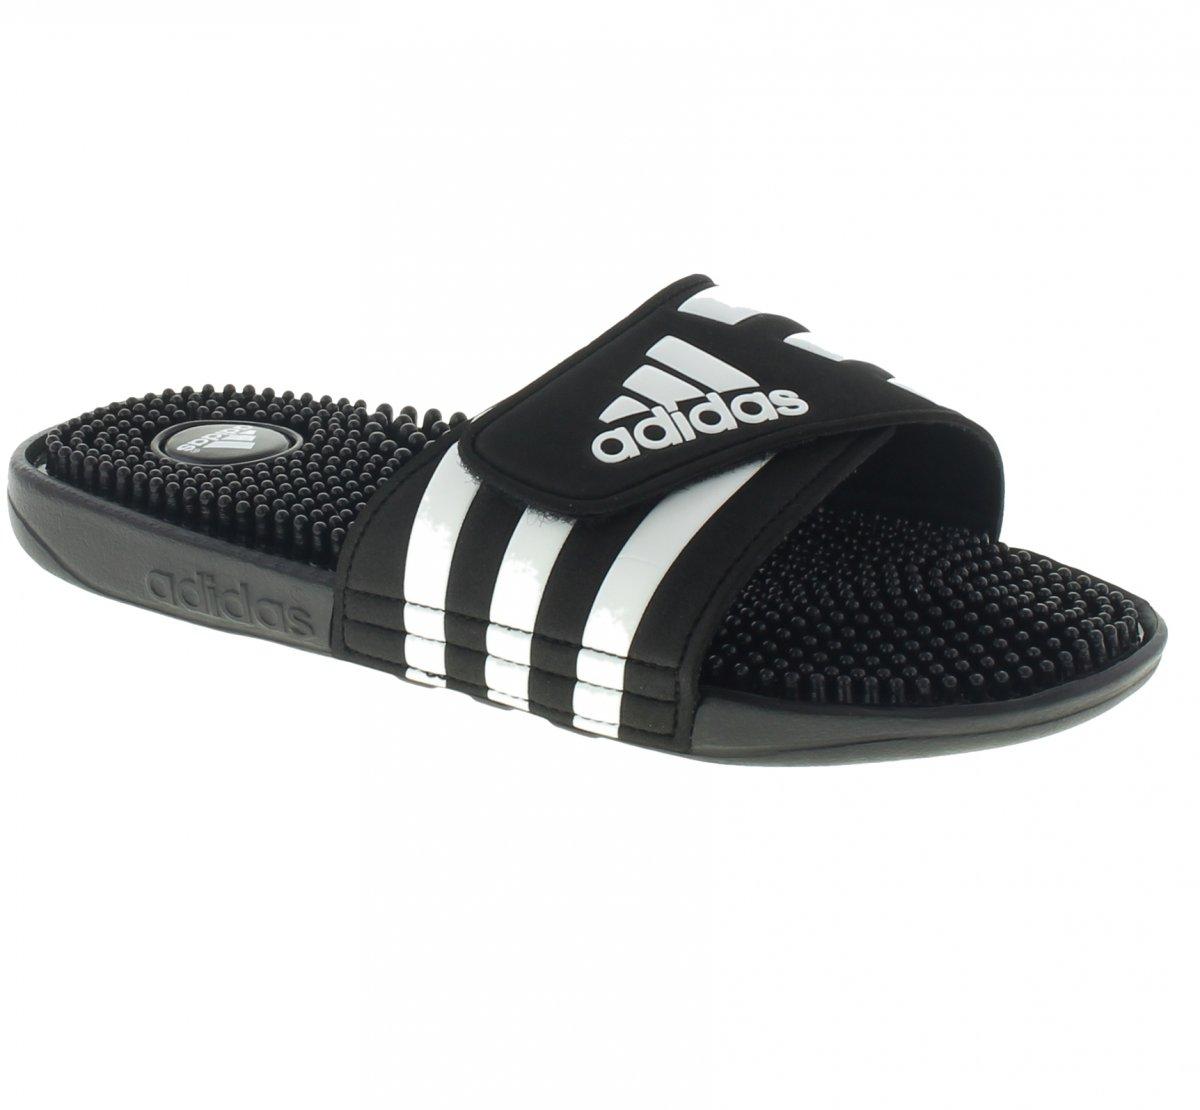 4a305ad760 Chinelo Adidas Adissage 078260